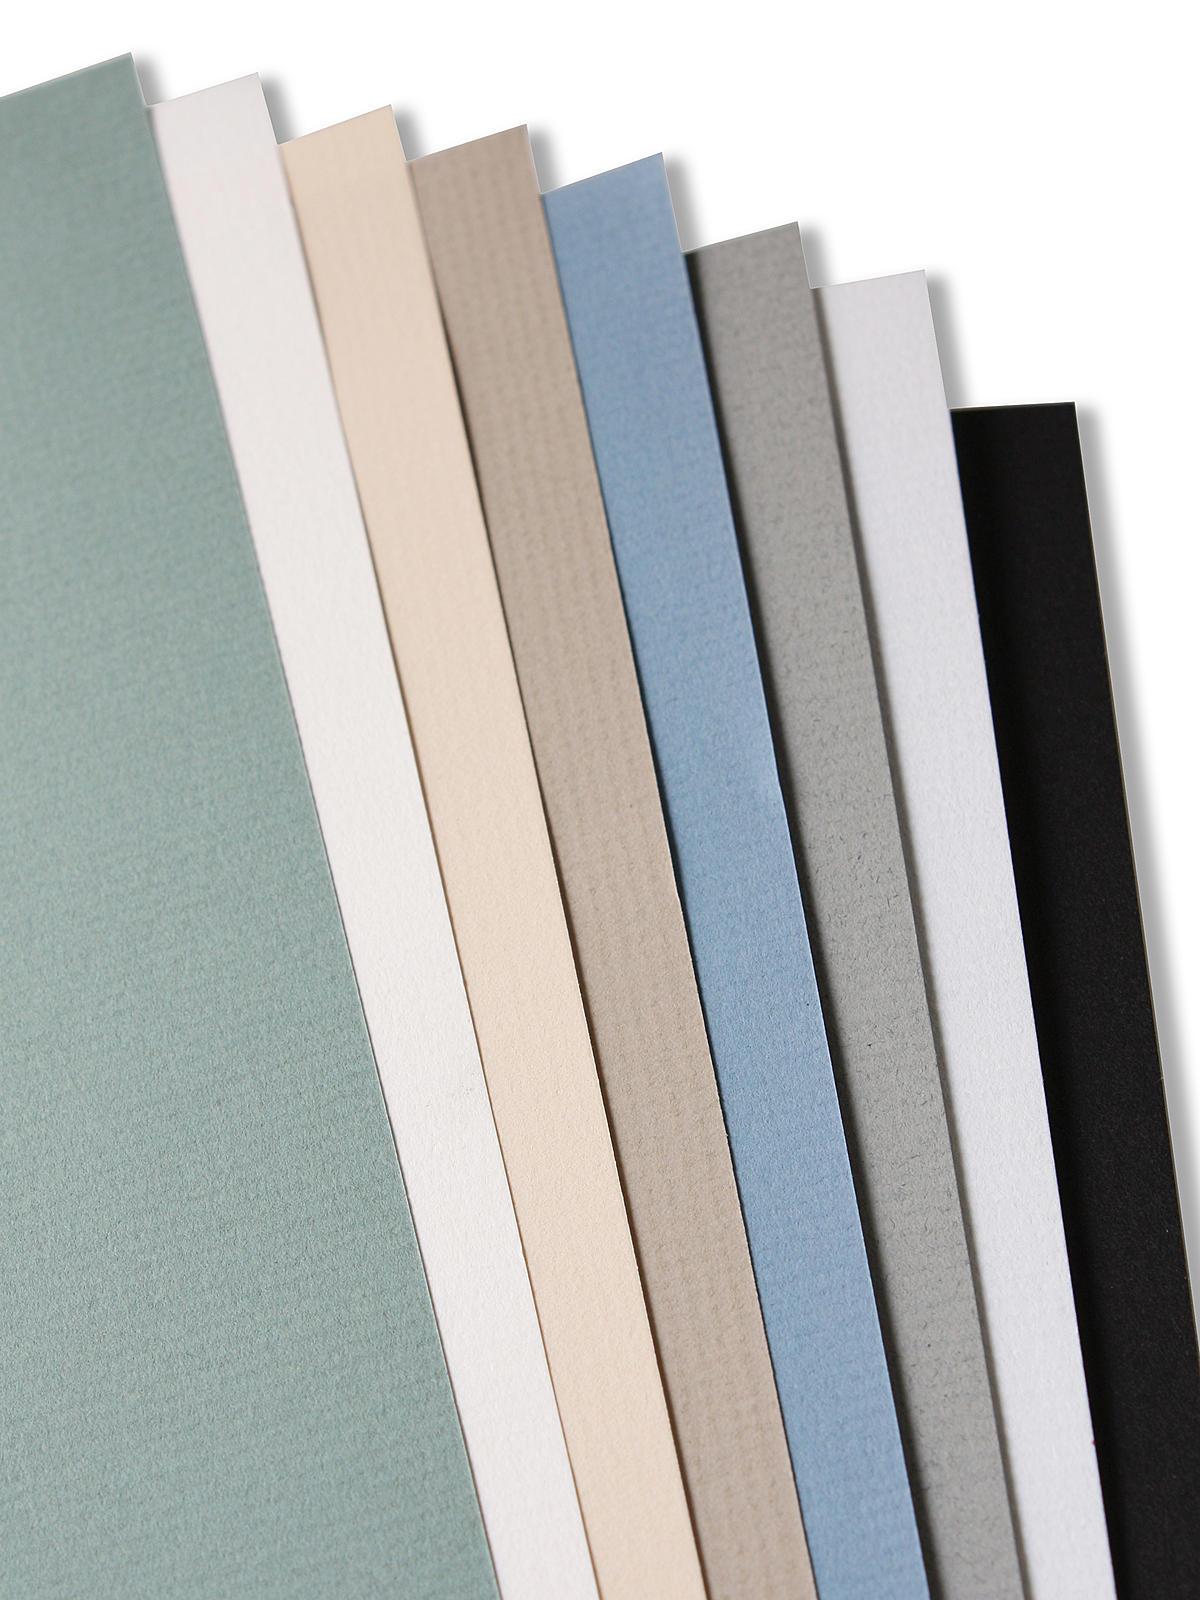 Strathmore Charcoal Paper Misterart Com